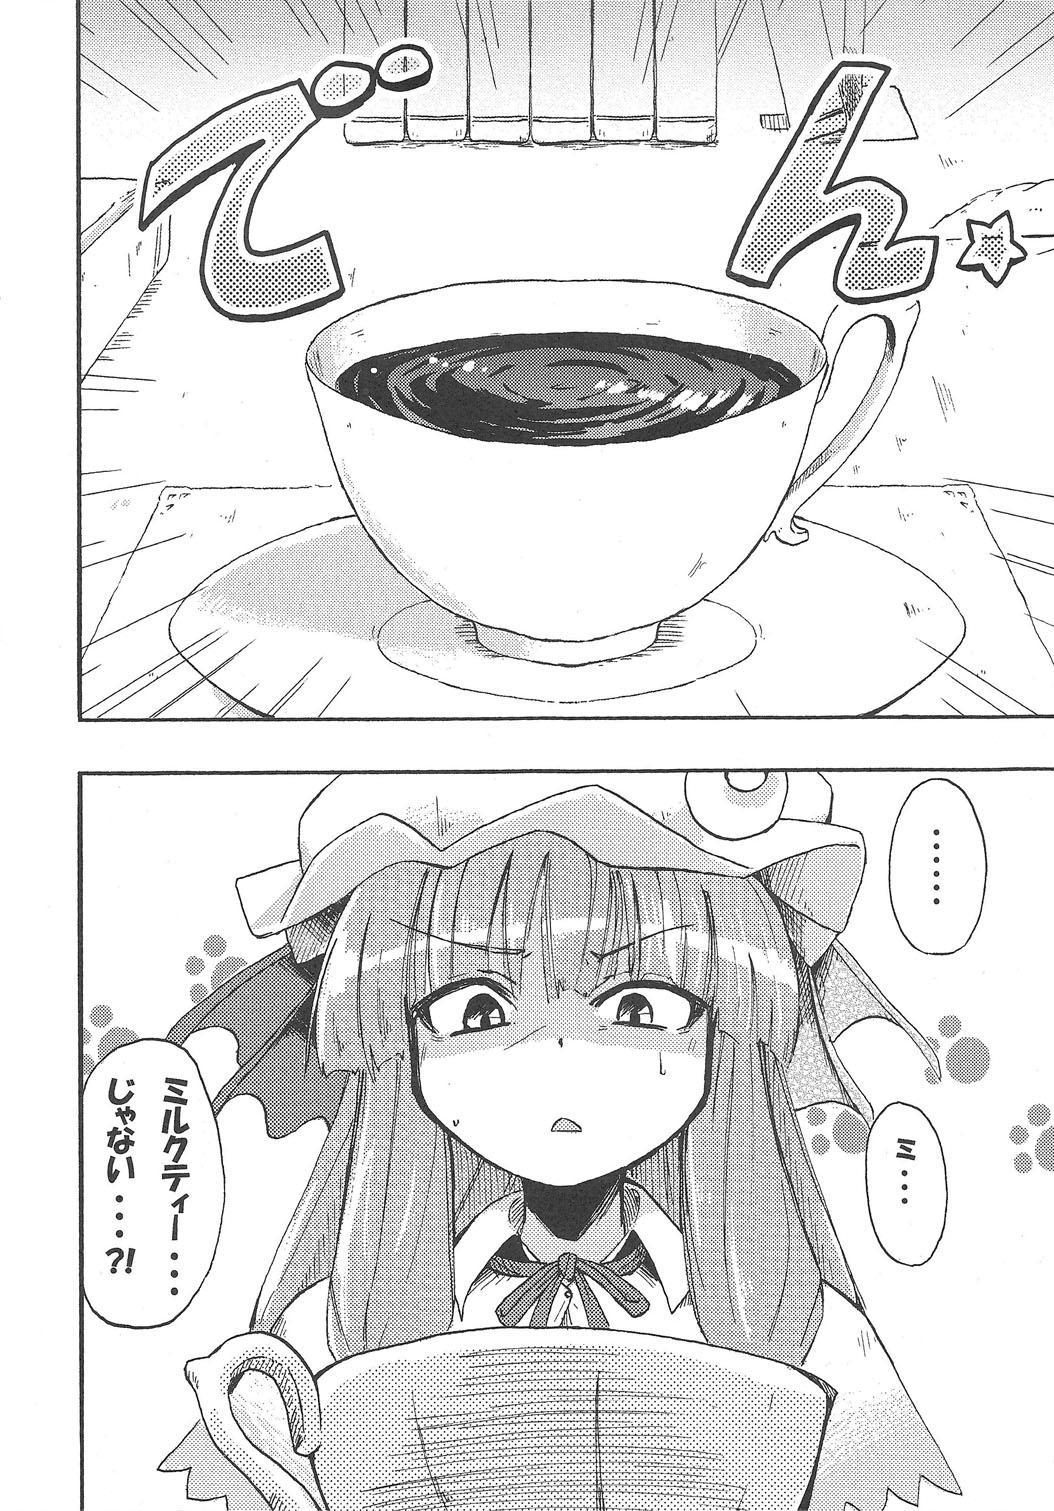 Homuraya Milk ★ Collection 10